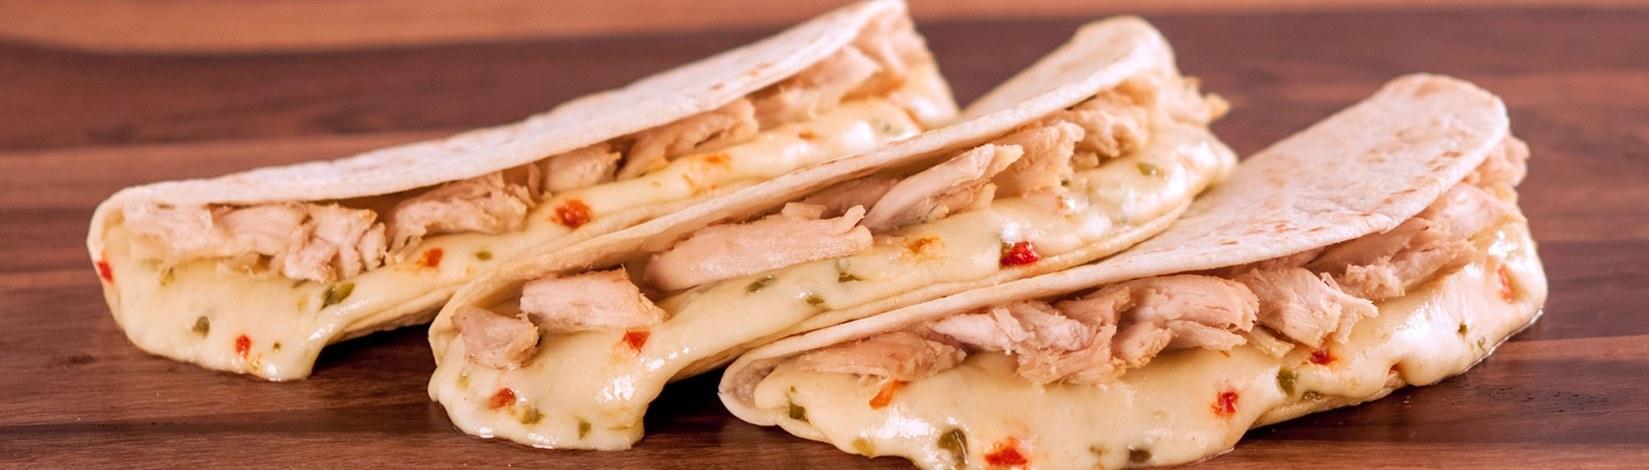 Chihuahua 174 Cheese Chicken Quesadillas V Amp V Supremo Foods Inc